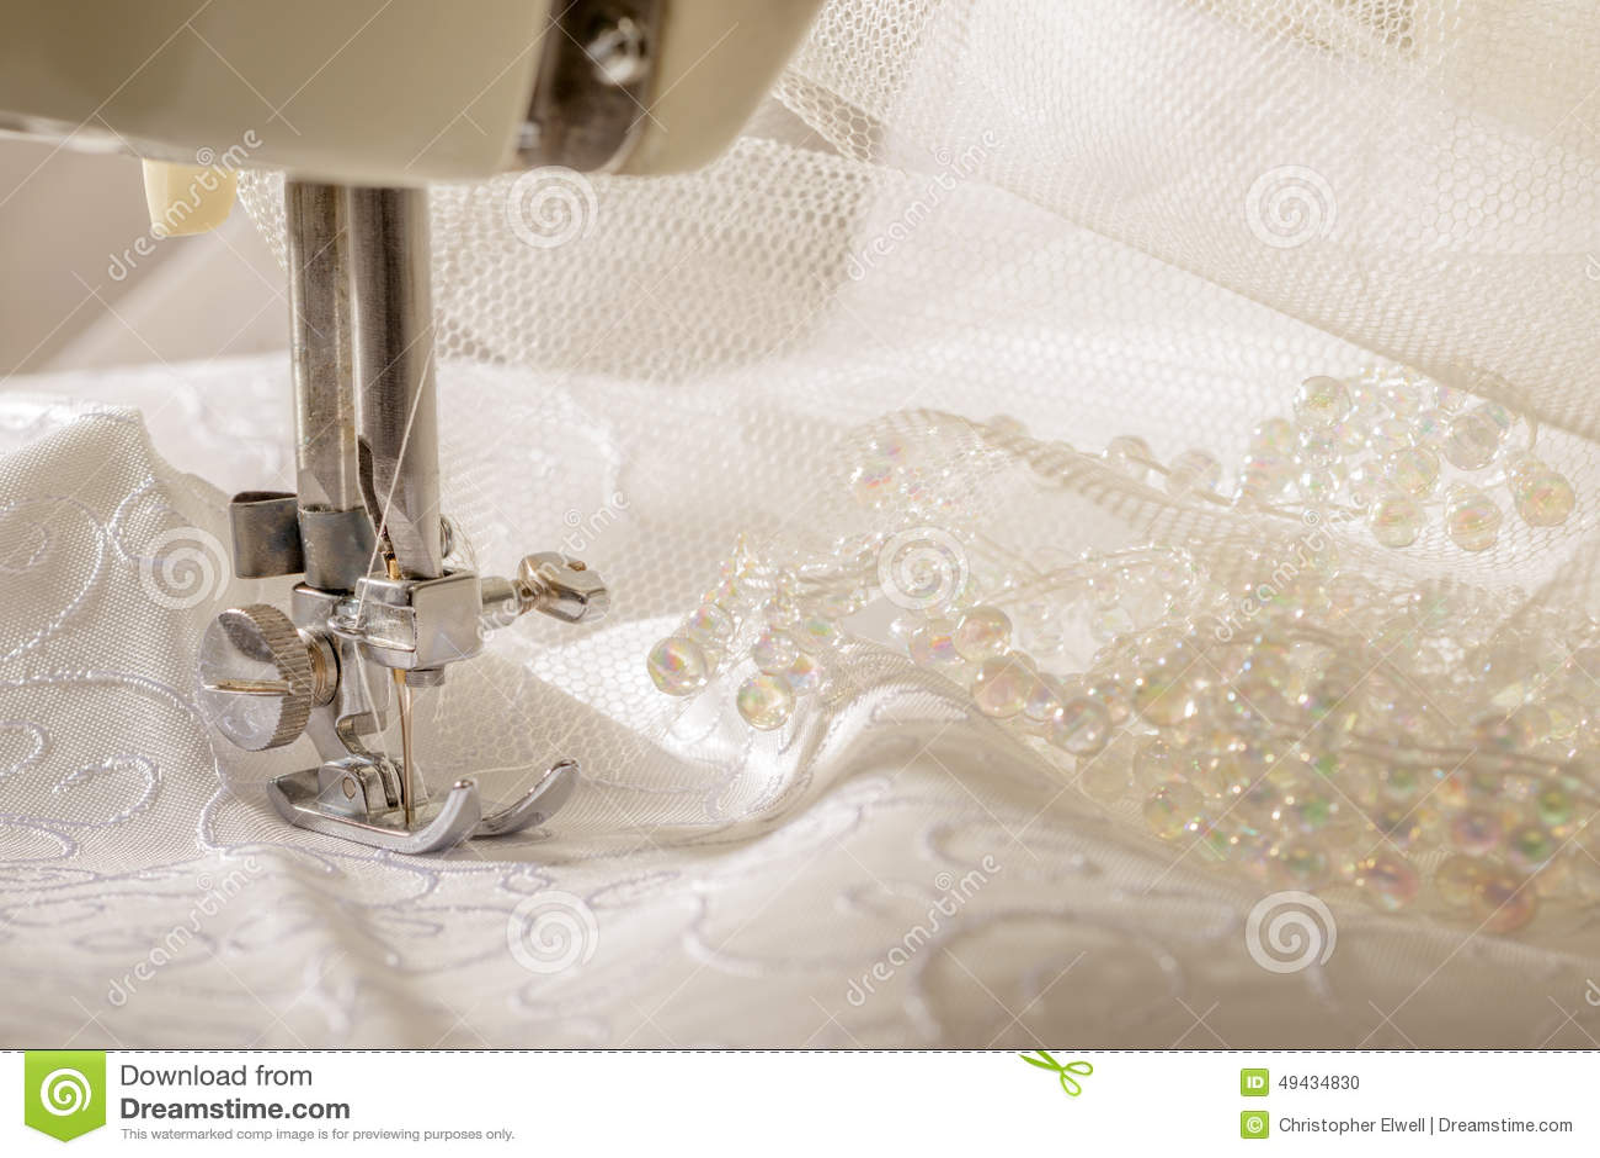 vintage sewing machine stock photo image of bridal ivory